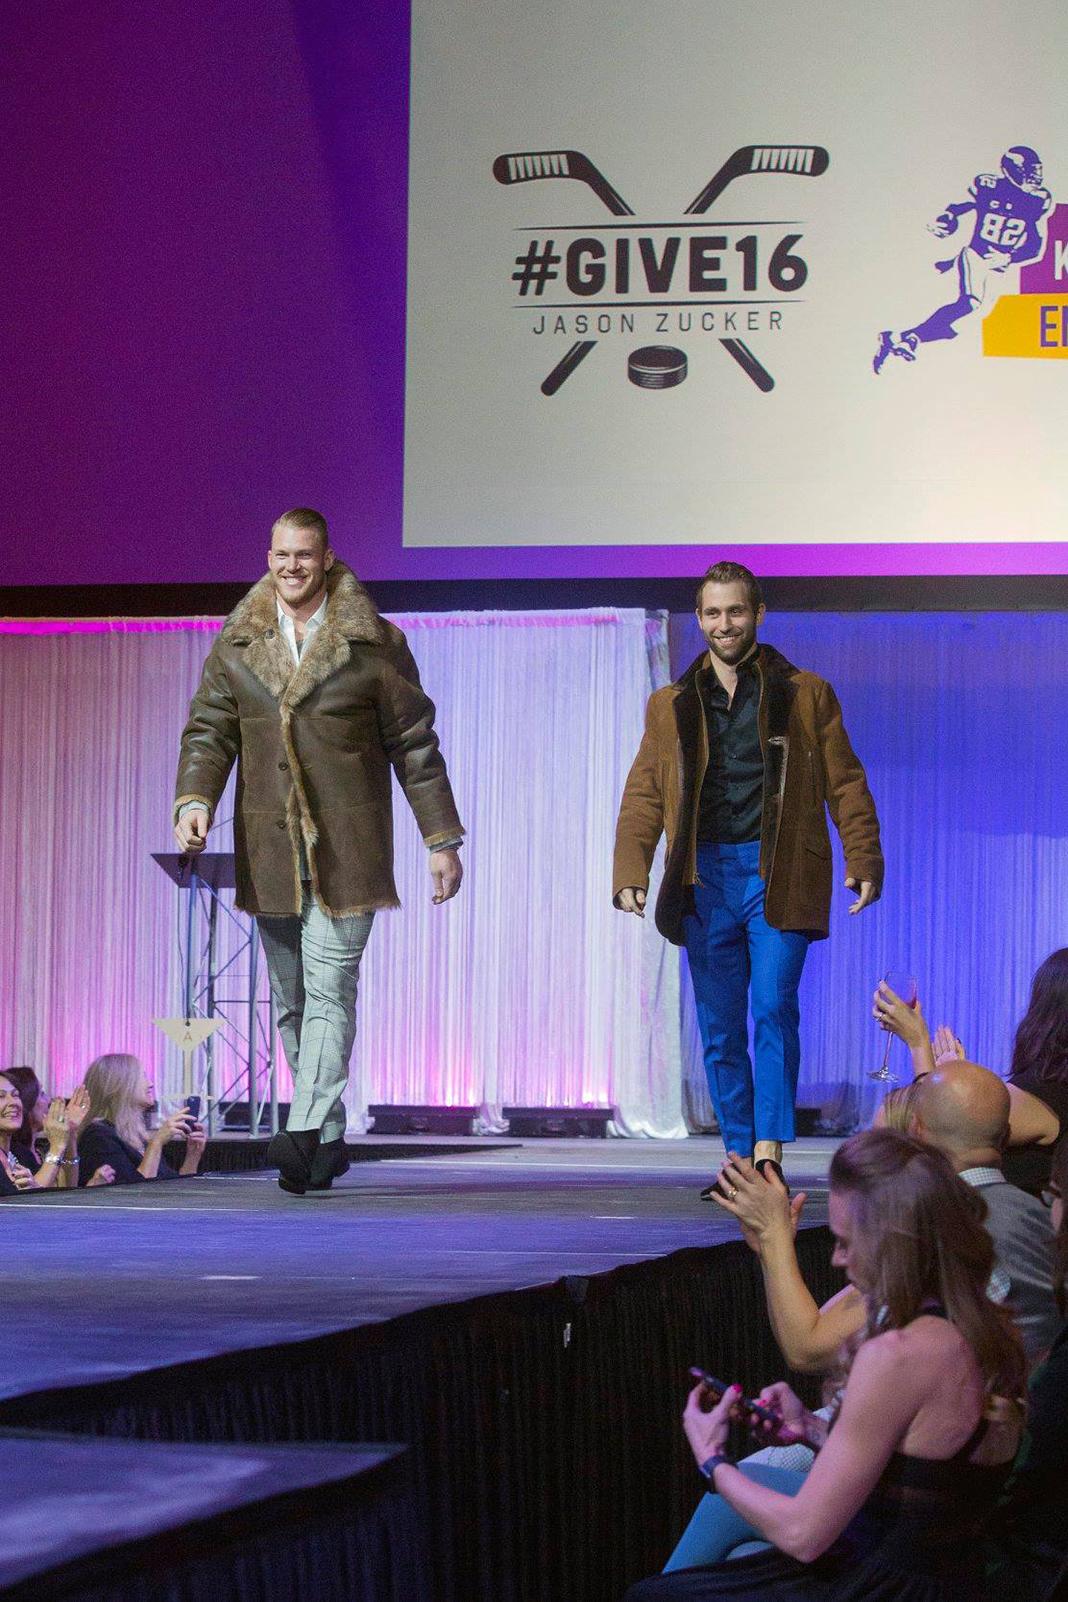 Minnesota Vikings tight end Kyle Rudolph and Minnesota Wild left wing Jason Zucker walk the runway at FashionFest 2018.